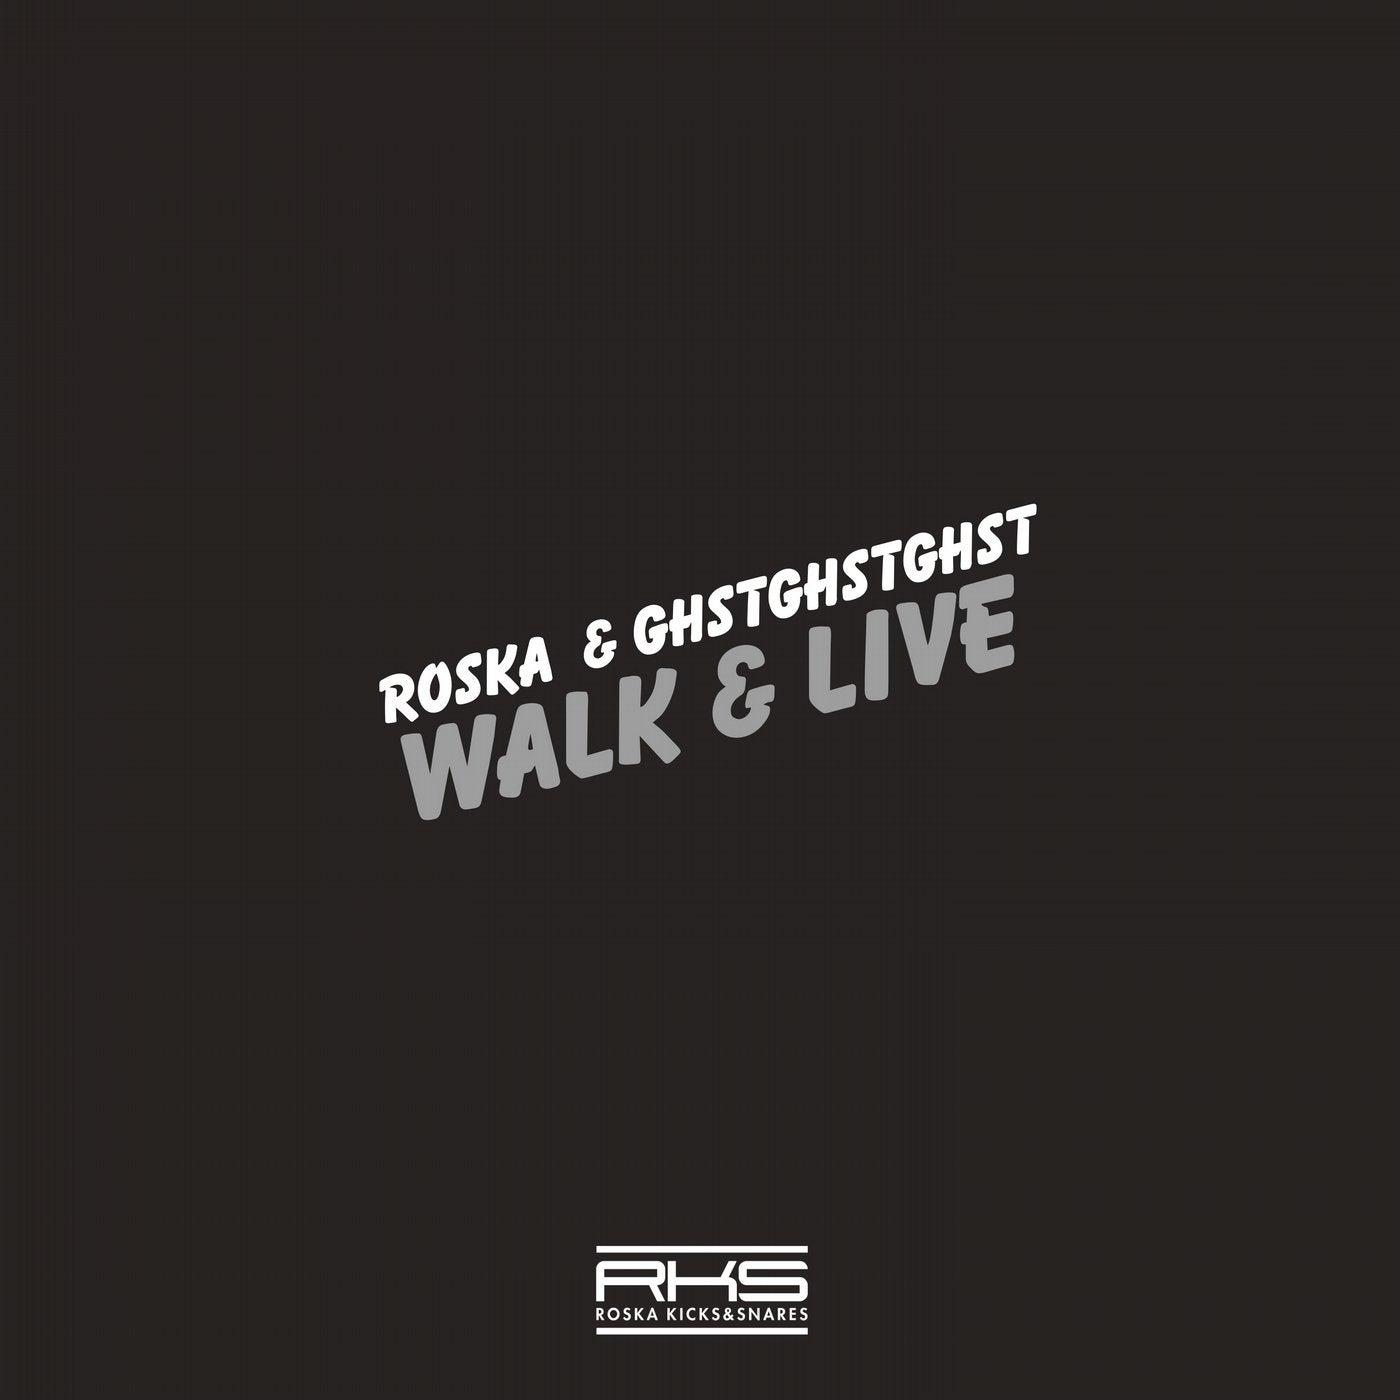 Walk & Live (Original Mix)